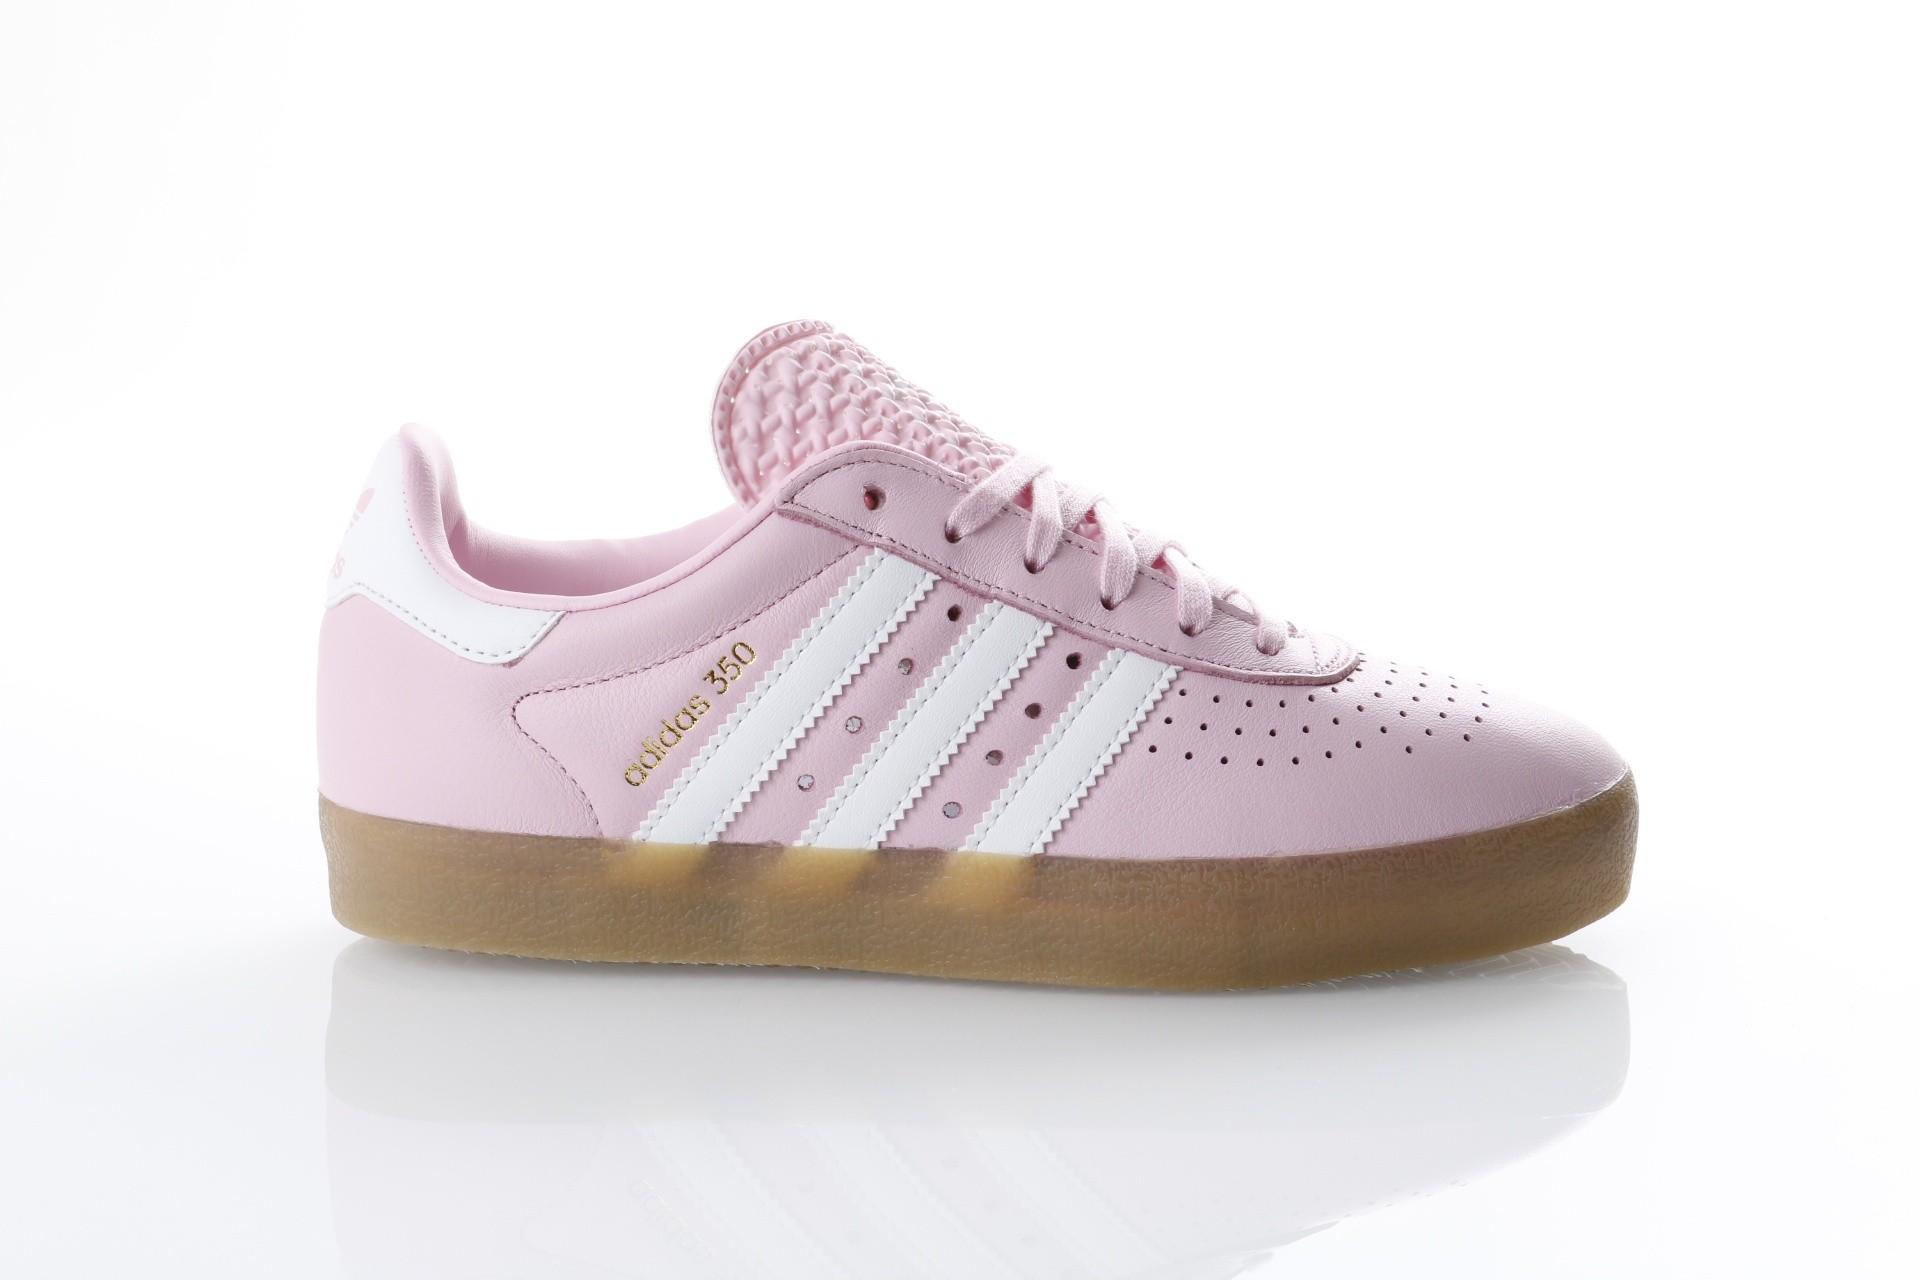 Foto van Adidas Originals CQ2345 Sneakers Adidas 350 Roze